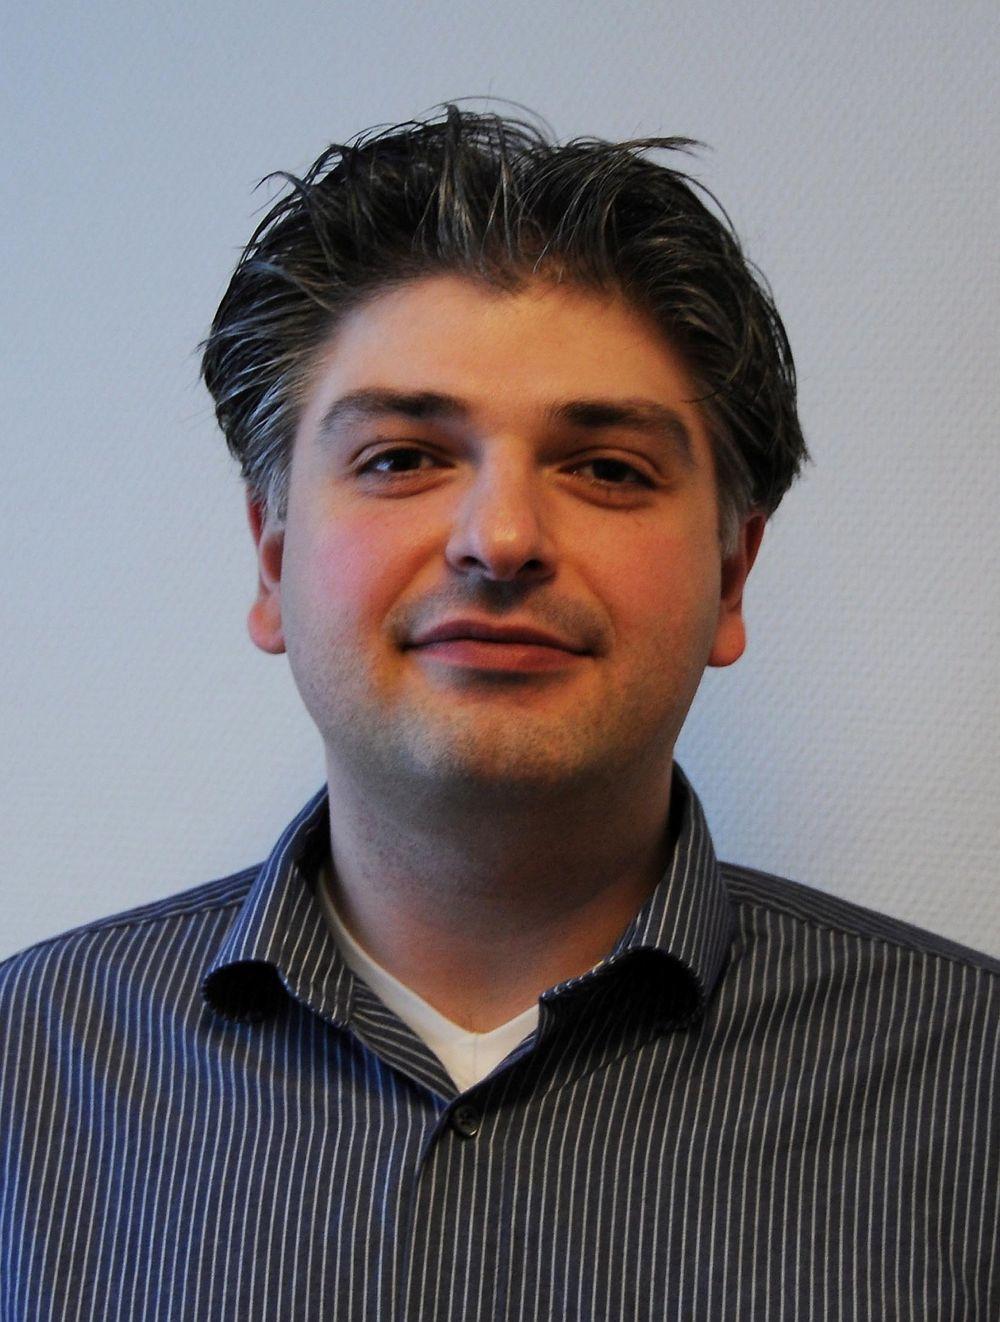 Babak Tabrizi leder Bosch Rexroth Pneumatics i Norge.